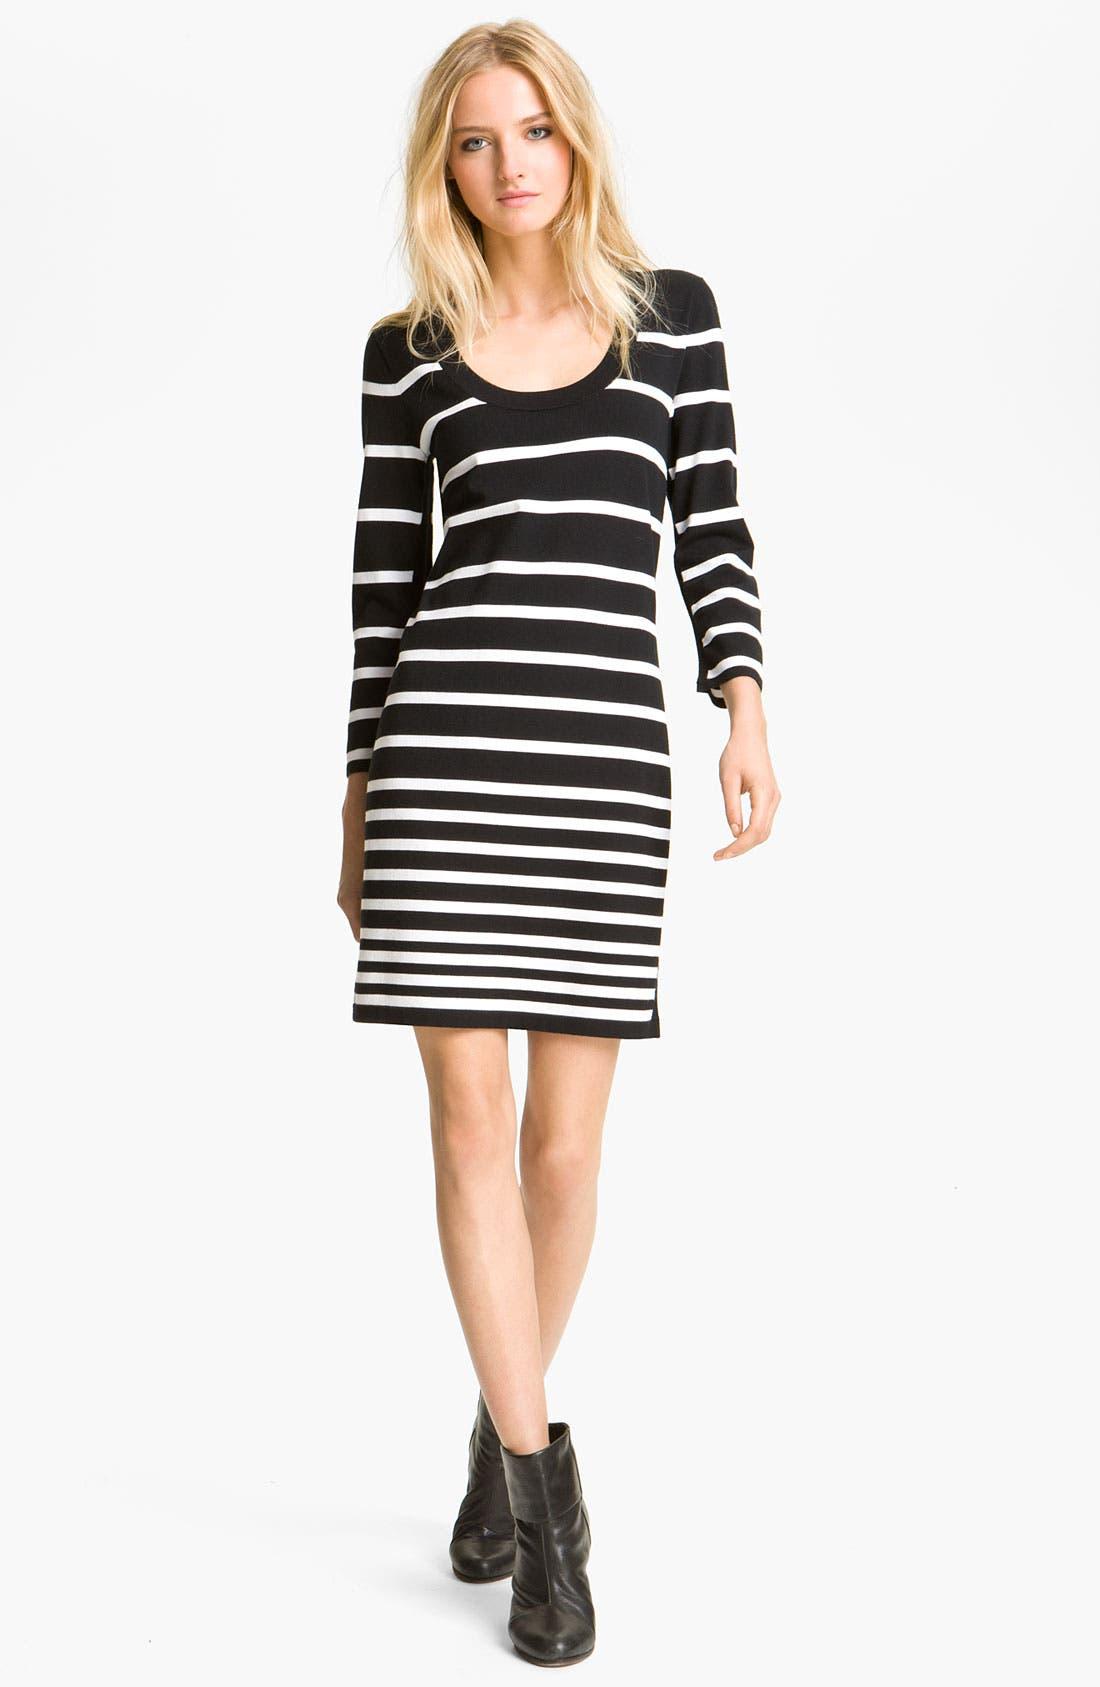 Alternate Image 1 Selected - rag & bone/SHIRT 'Ara' Stripe Dress